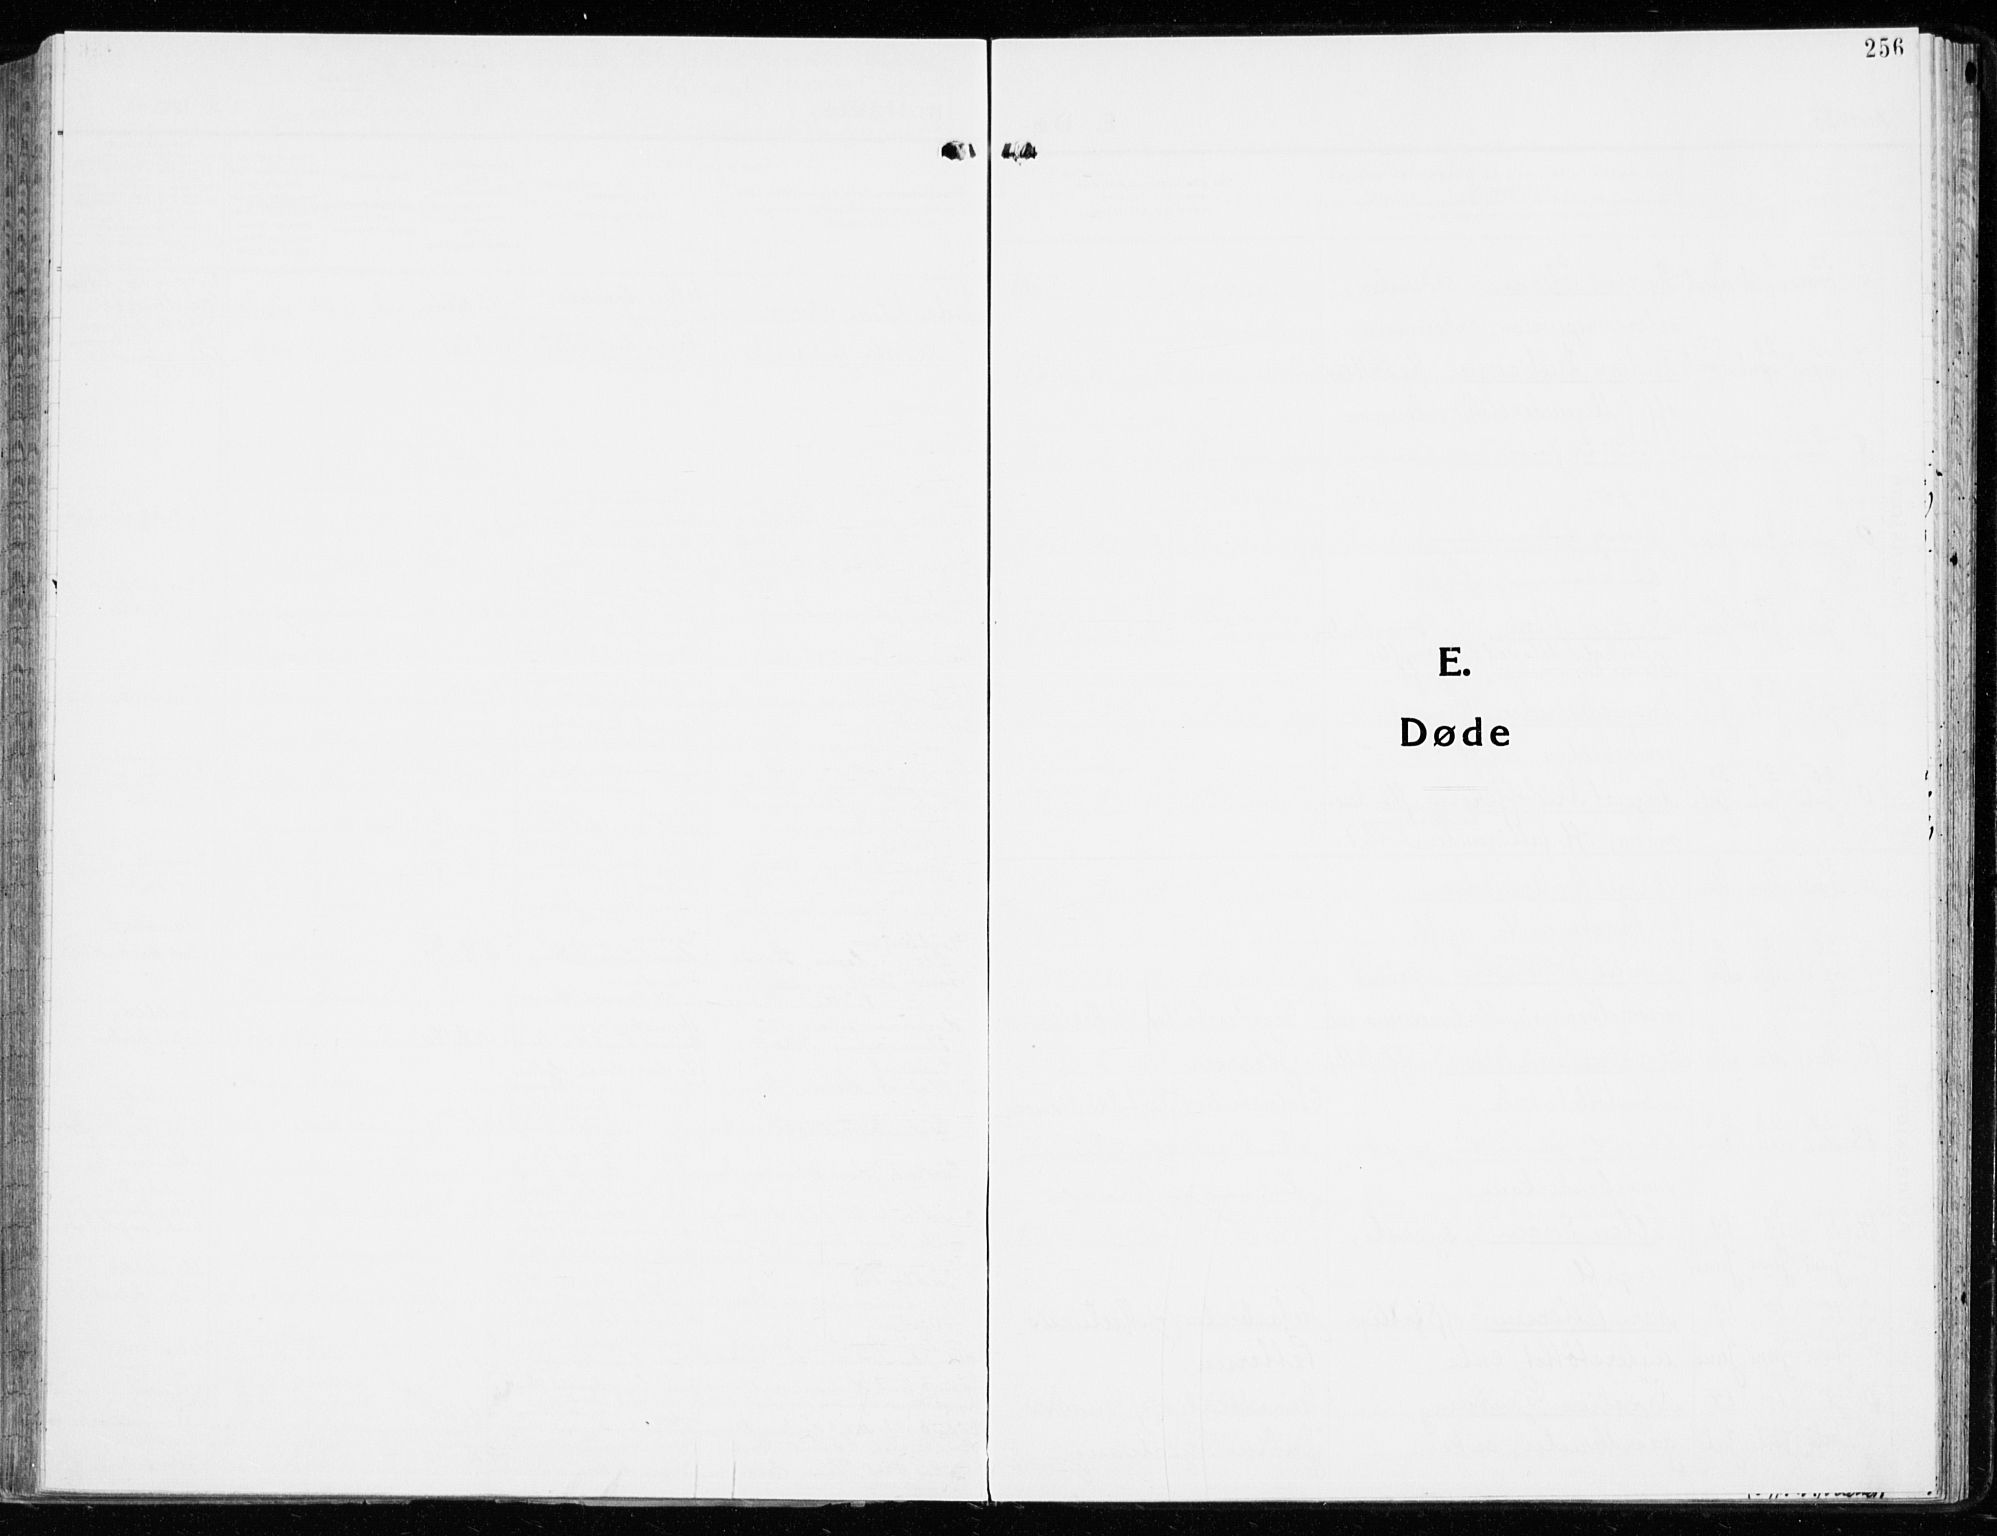 SAH, Stange prestekontor, K/L0027: Ministerialbok nr. 27, 1937-1947, s. 256